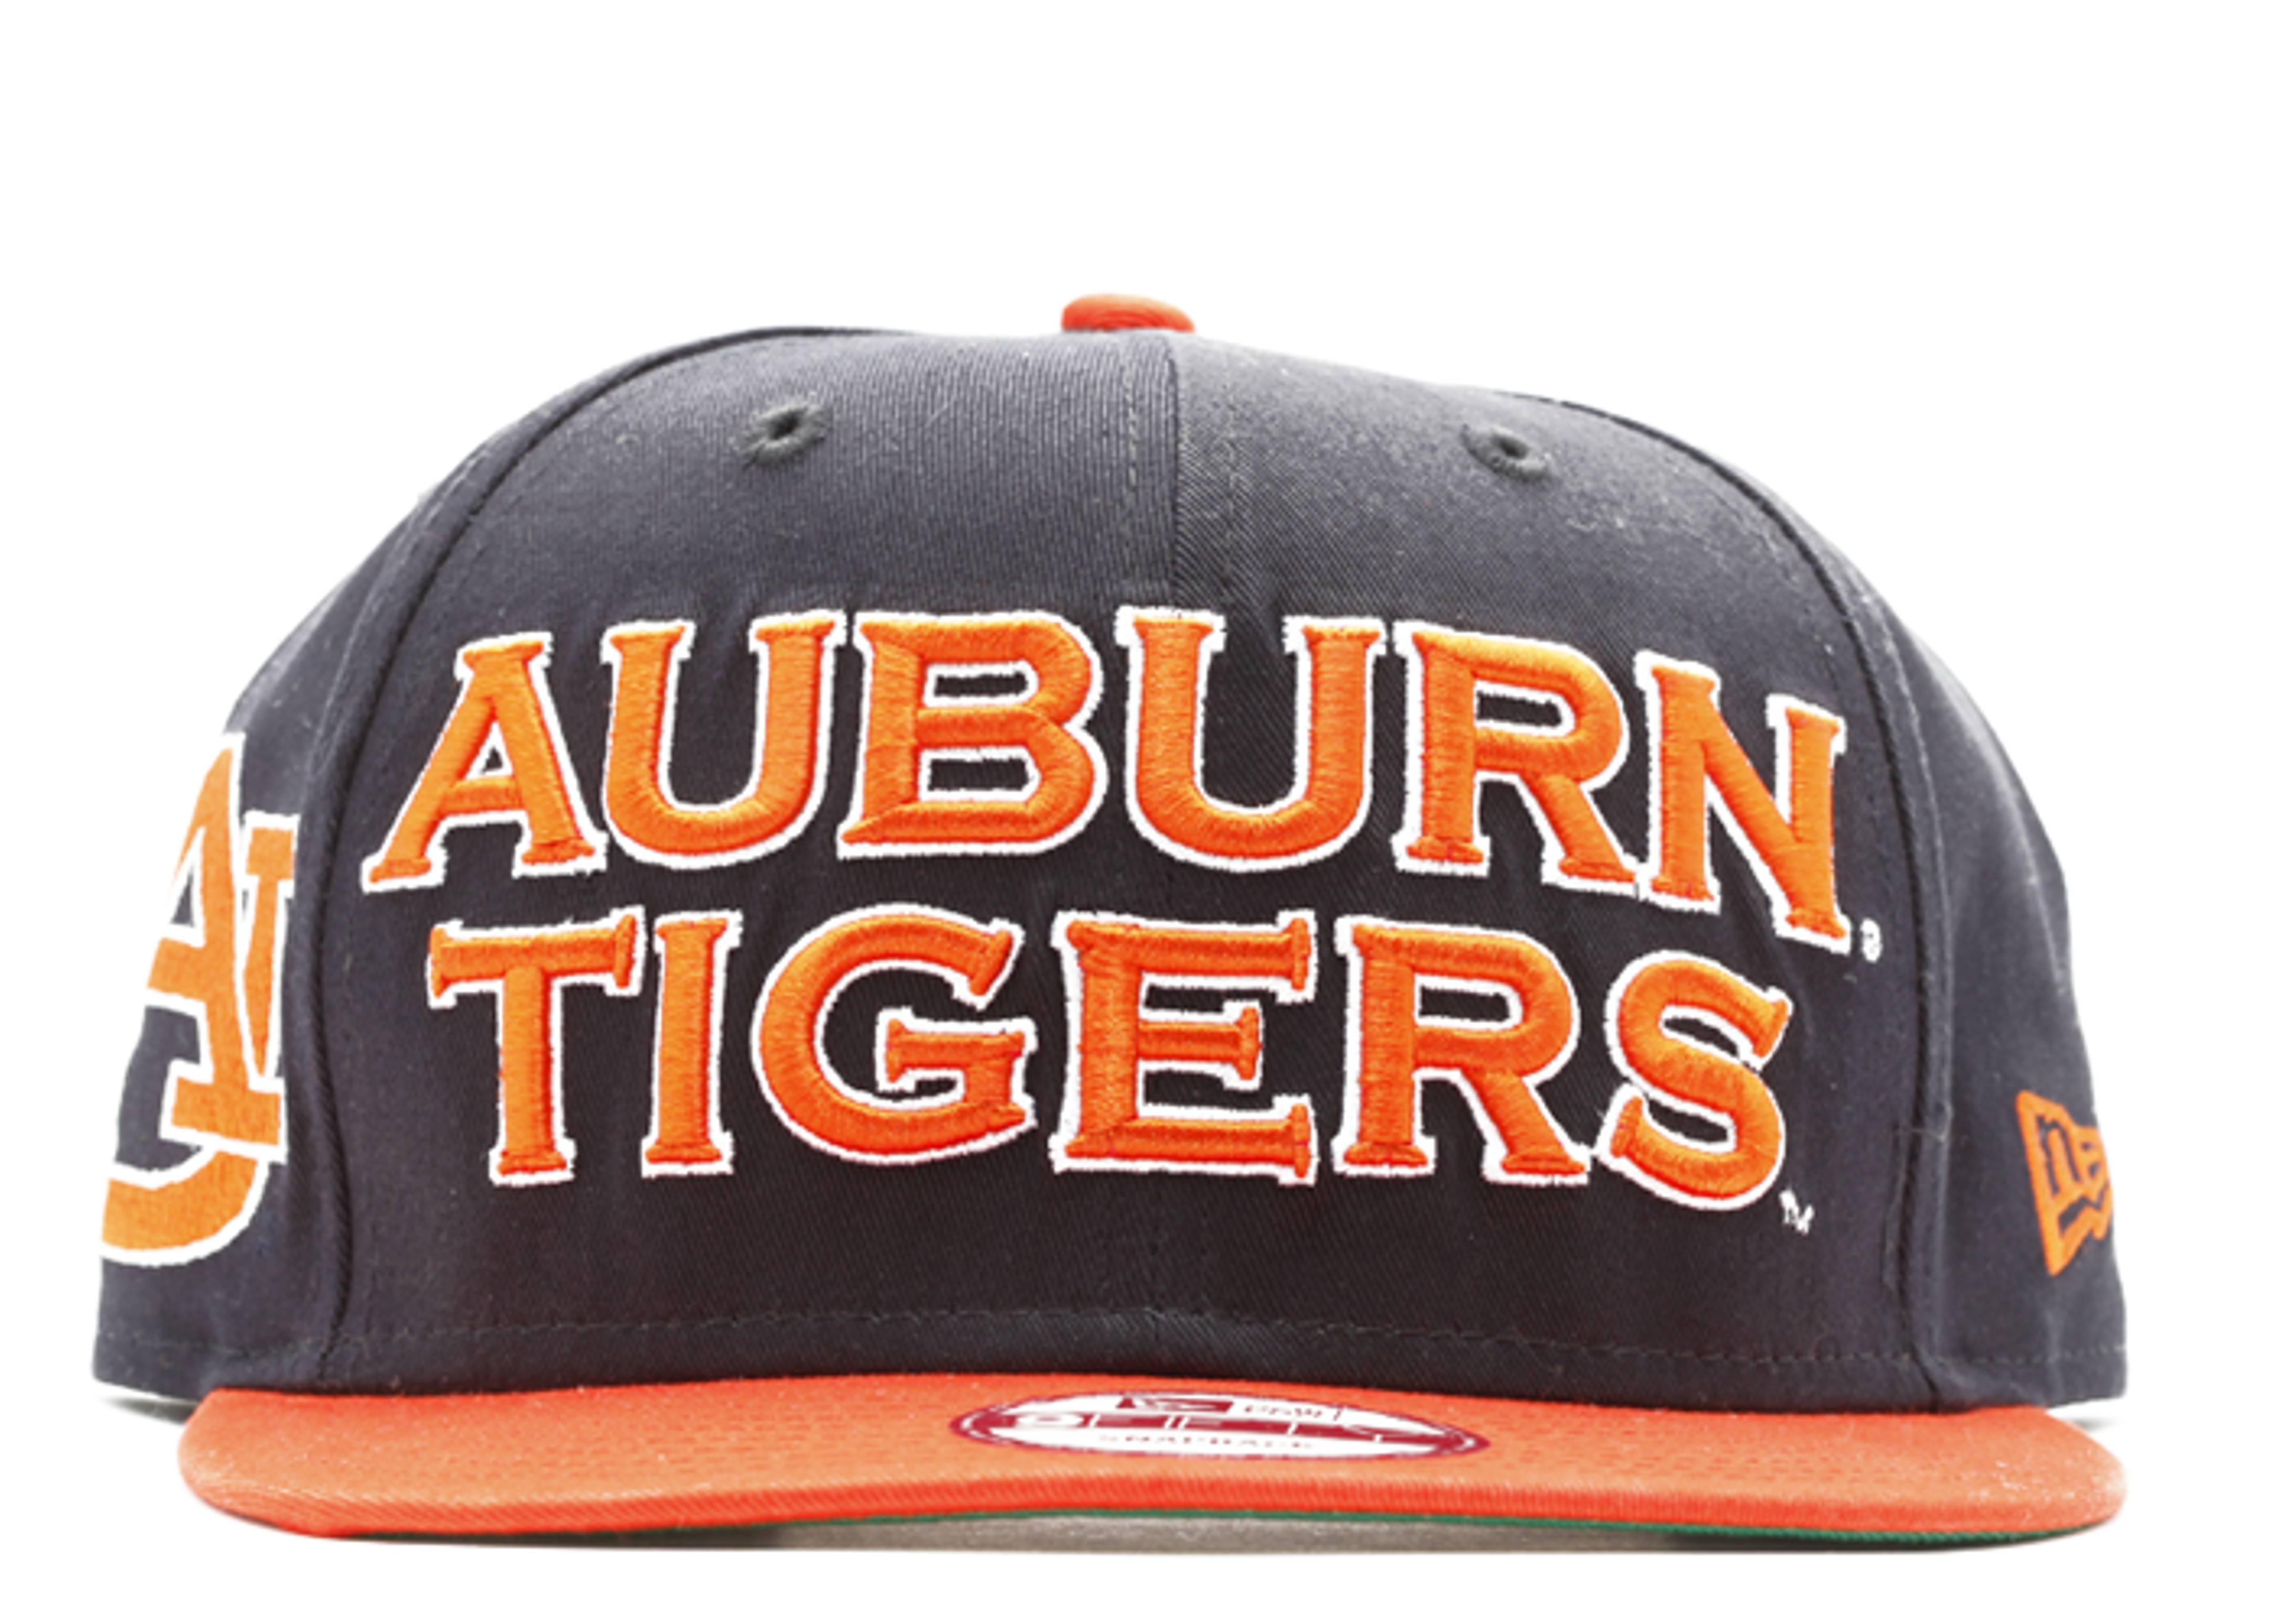 auburn tigers snap-back